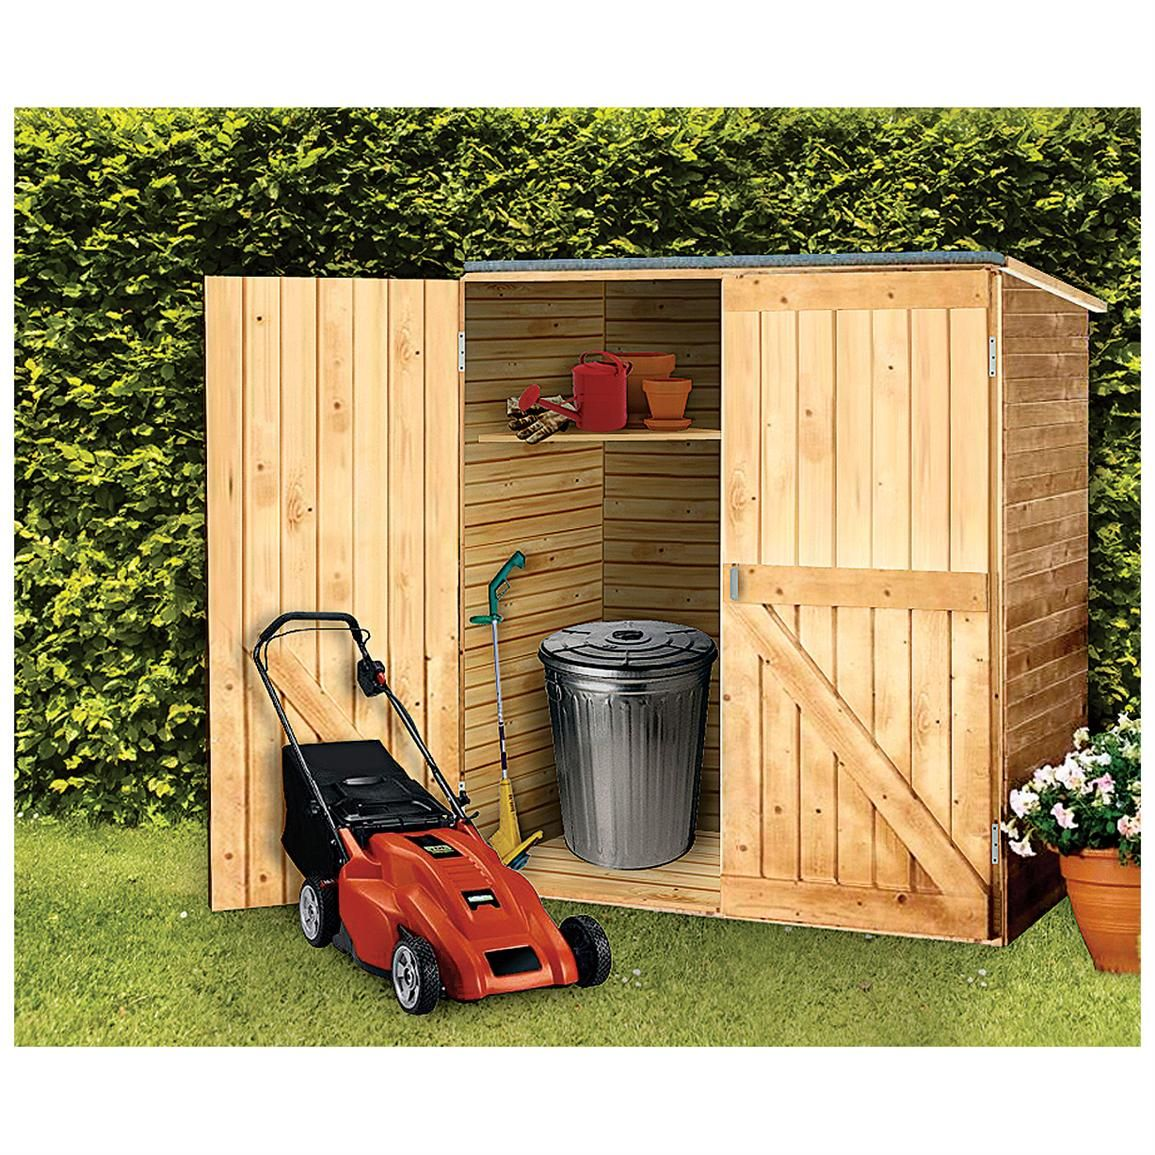 Build your own diy backyard organizers backyard storage